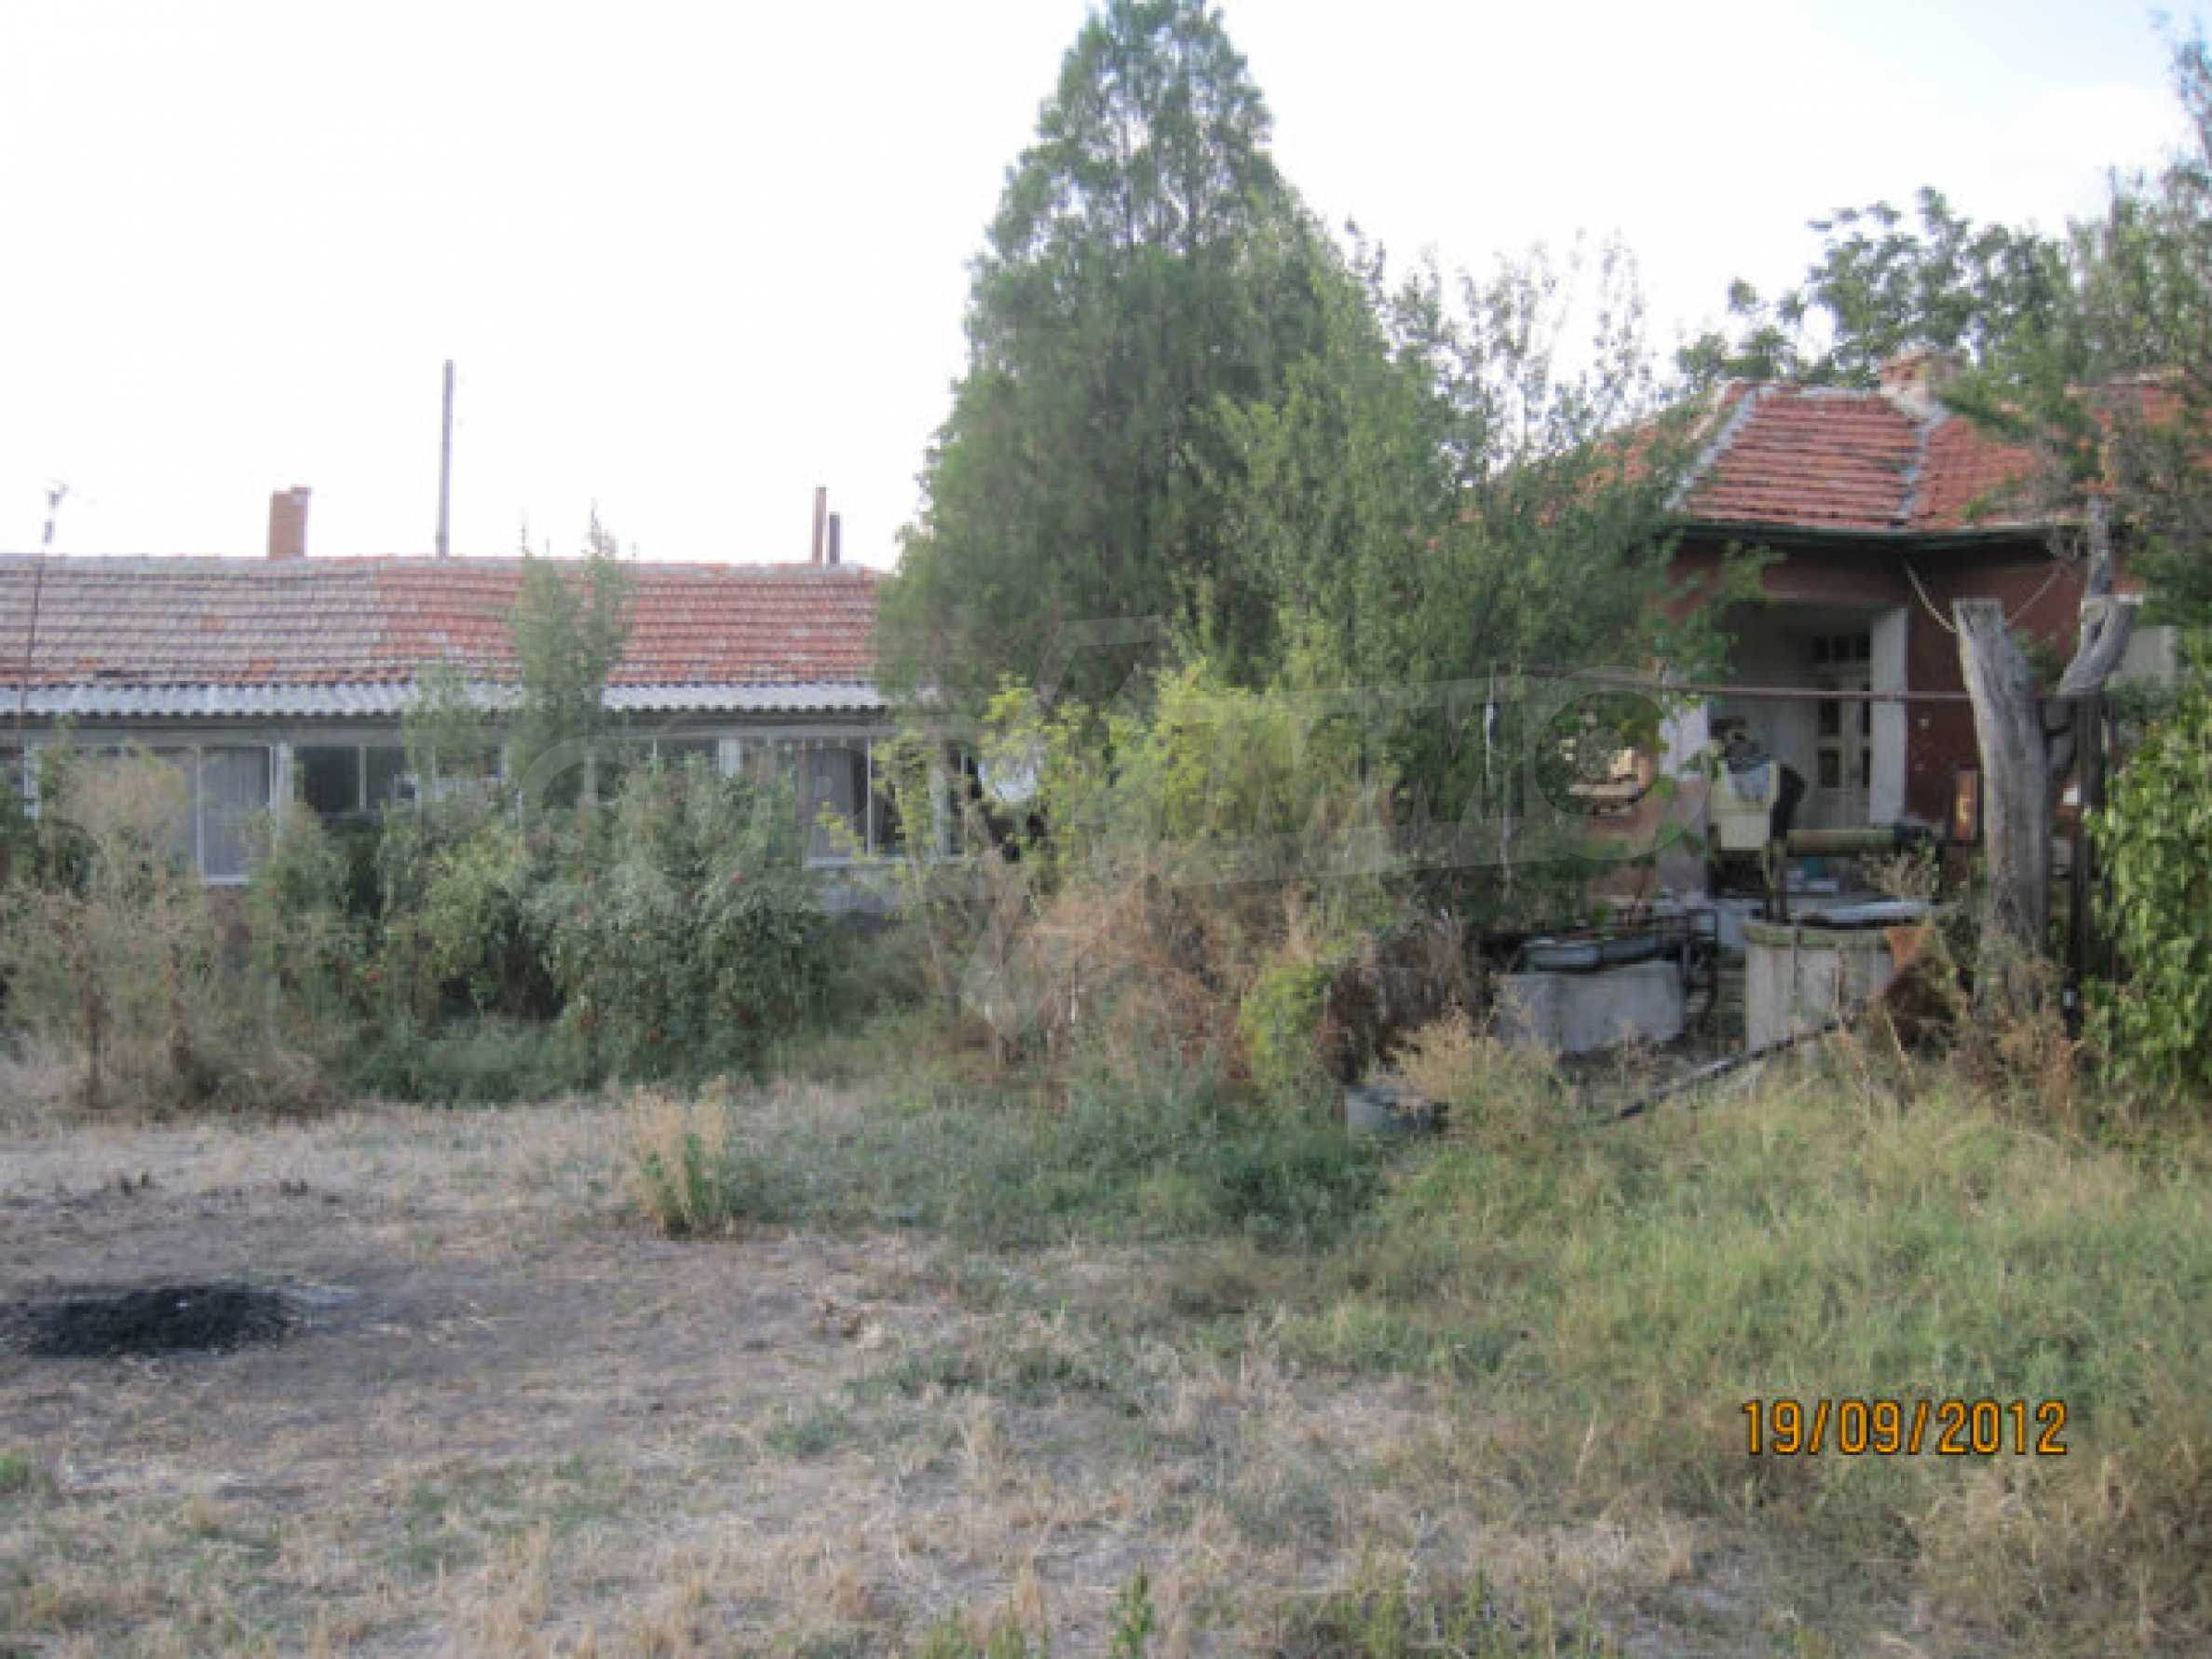 Detached house for sale in a quiet village near Dimitrovgrad 1